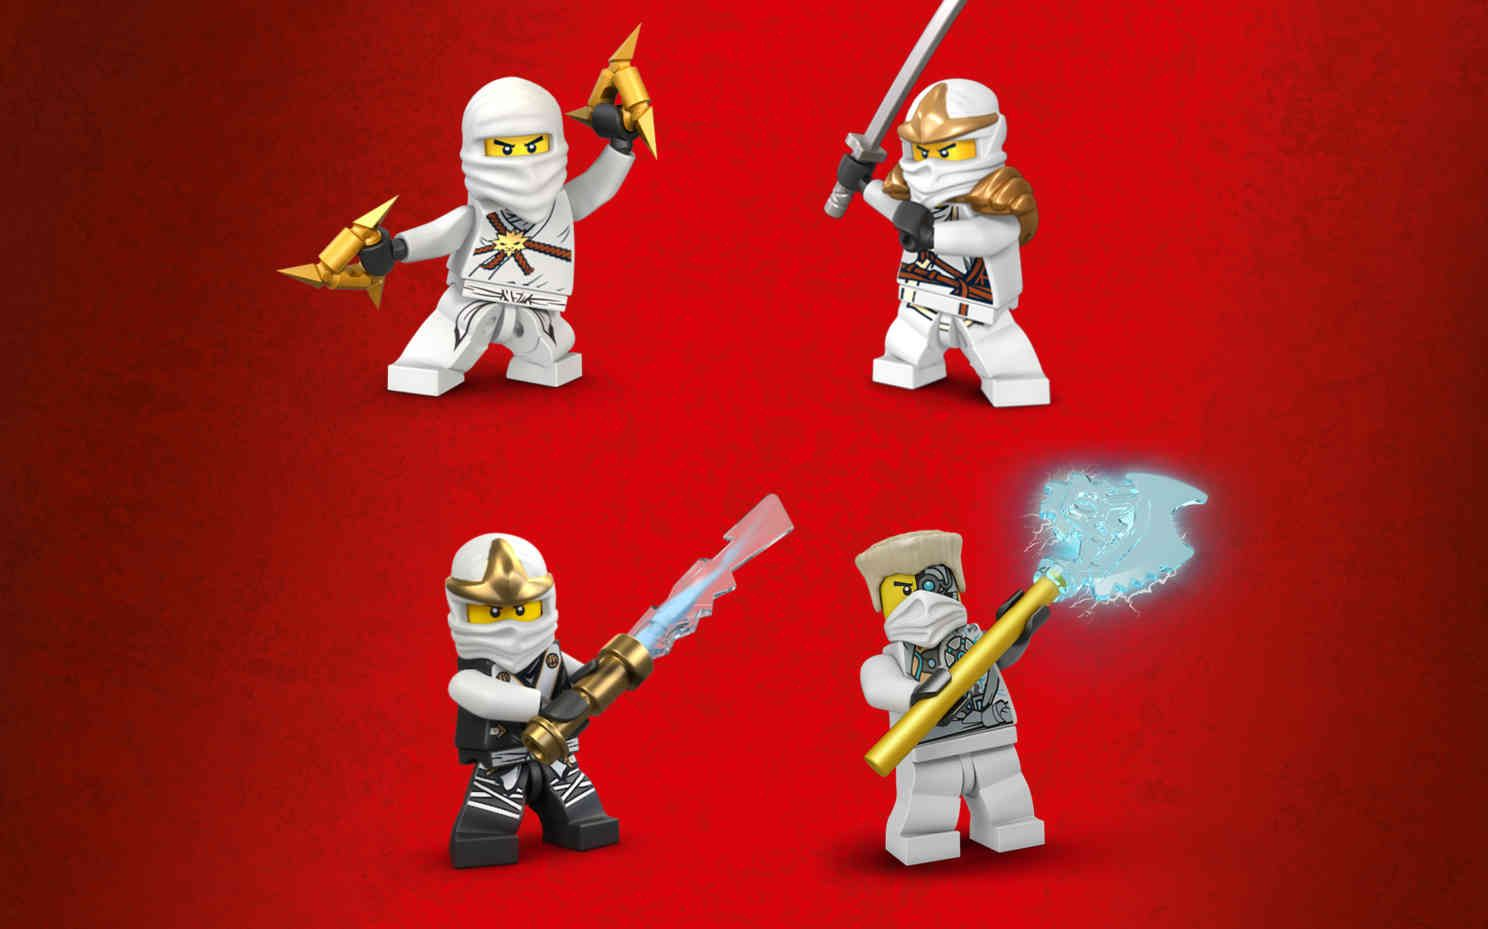 Lego Victor Zane NinjagoLes De Characters lKFJc1T